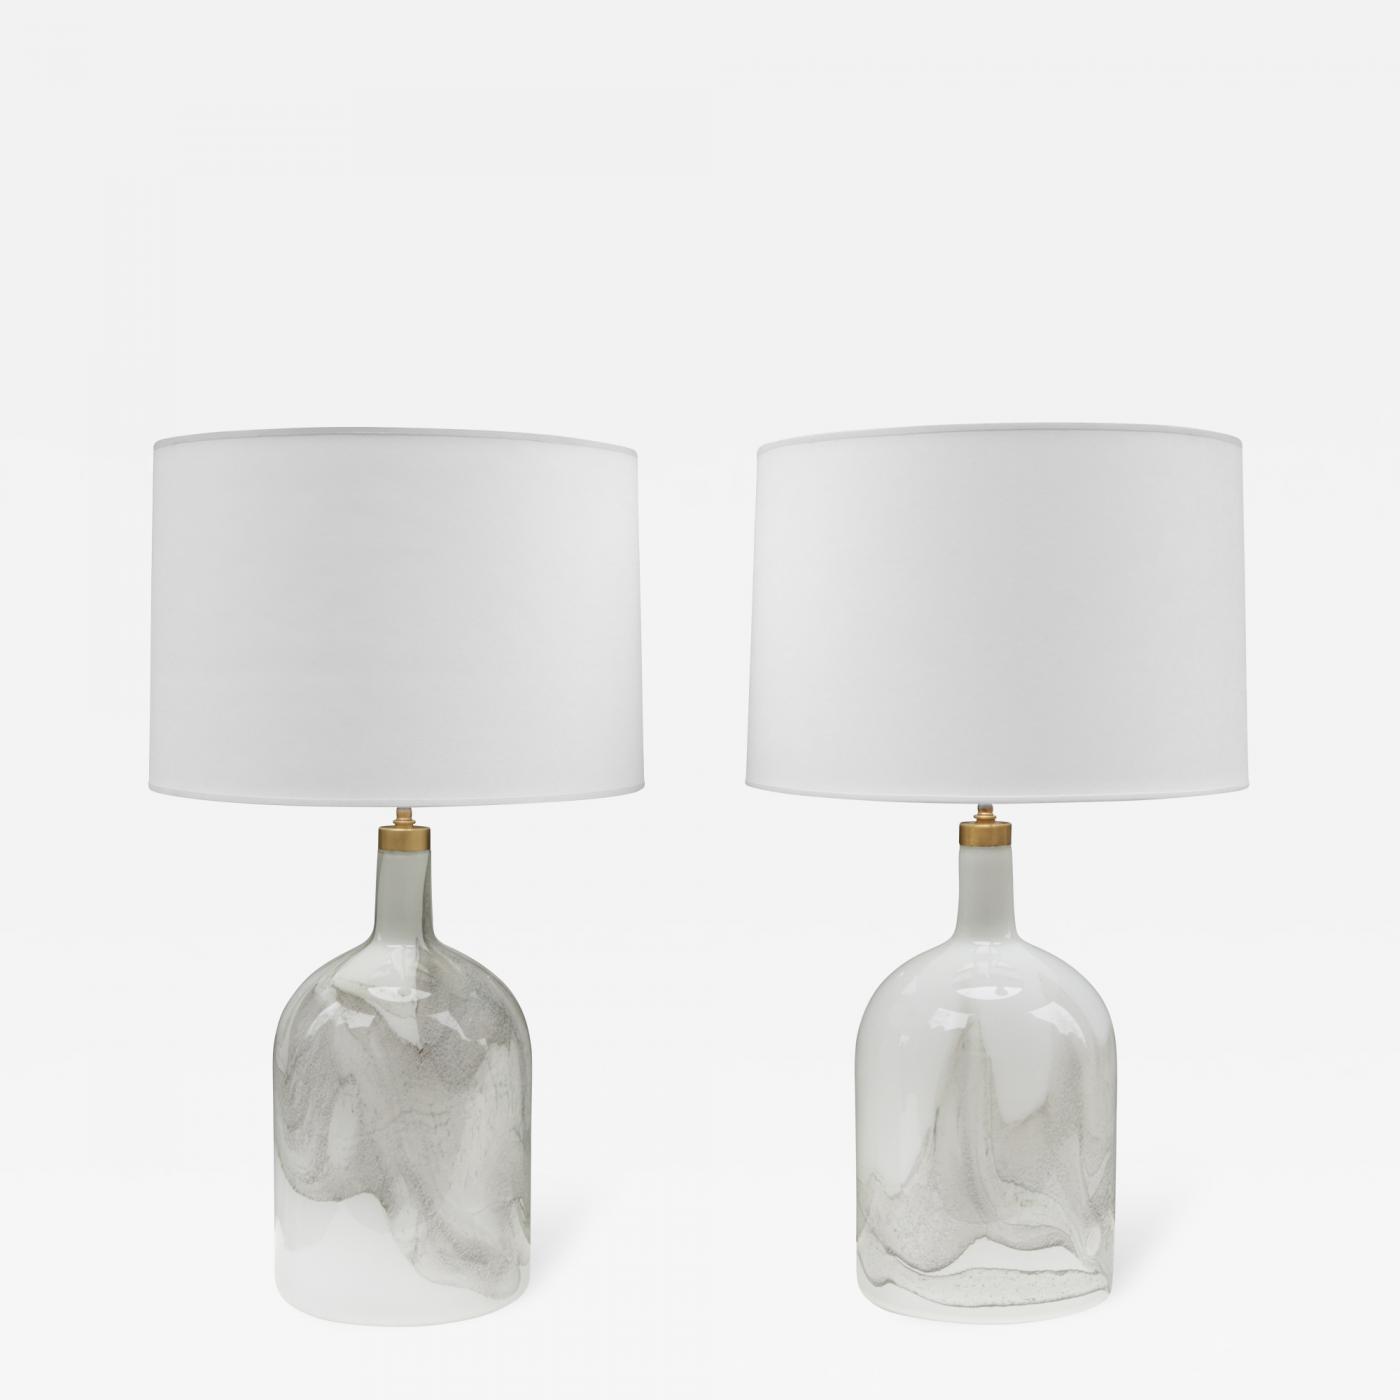 Michael bang pair of michael bang for holmgaard art glass table lamps listings furniture lighting table lamps aloadofball Images